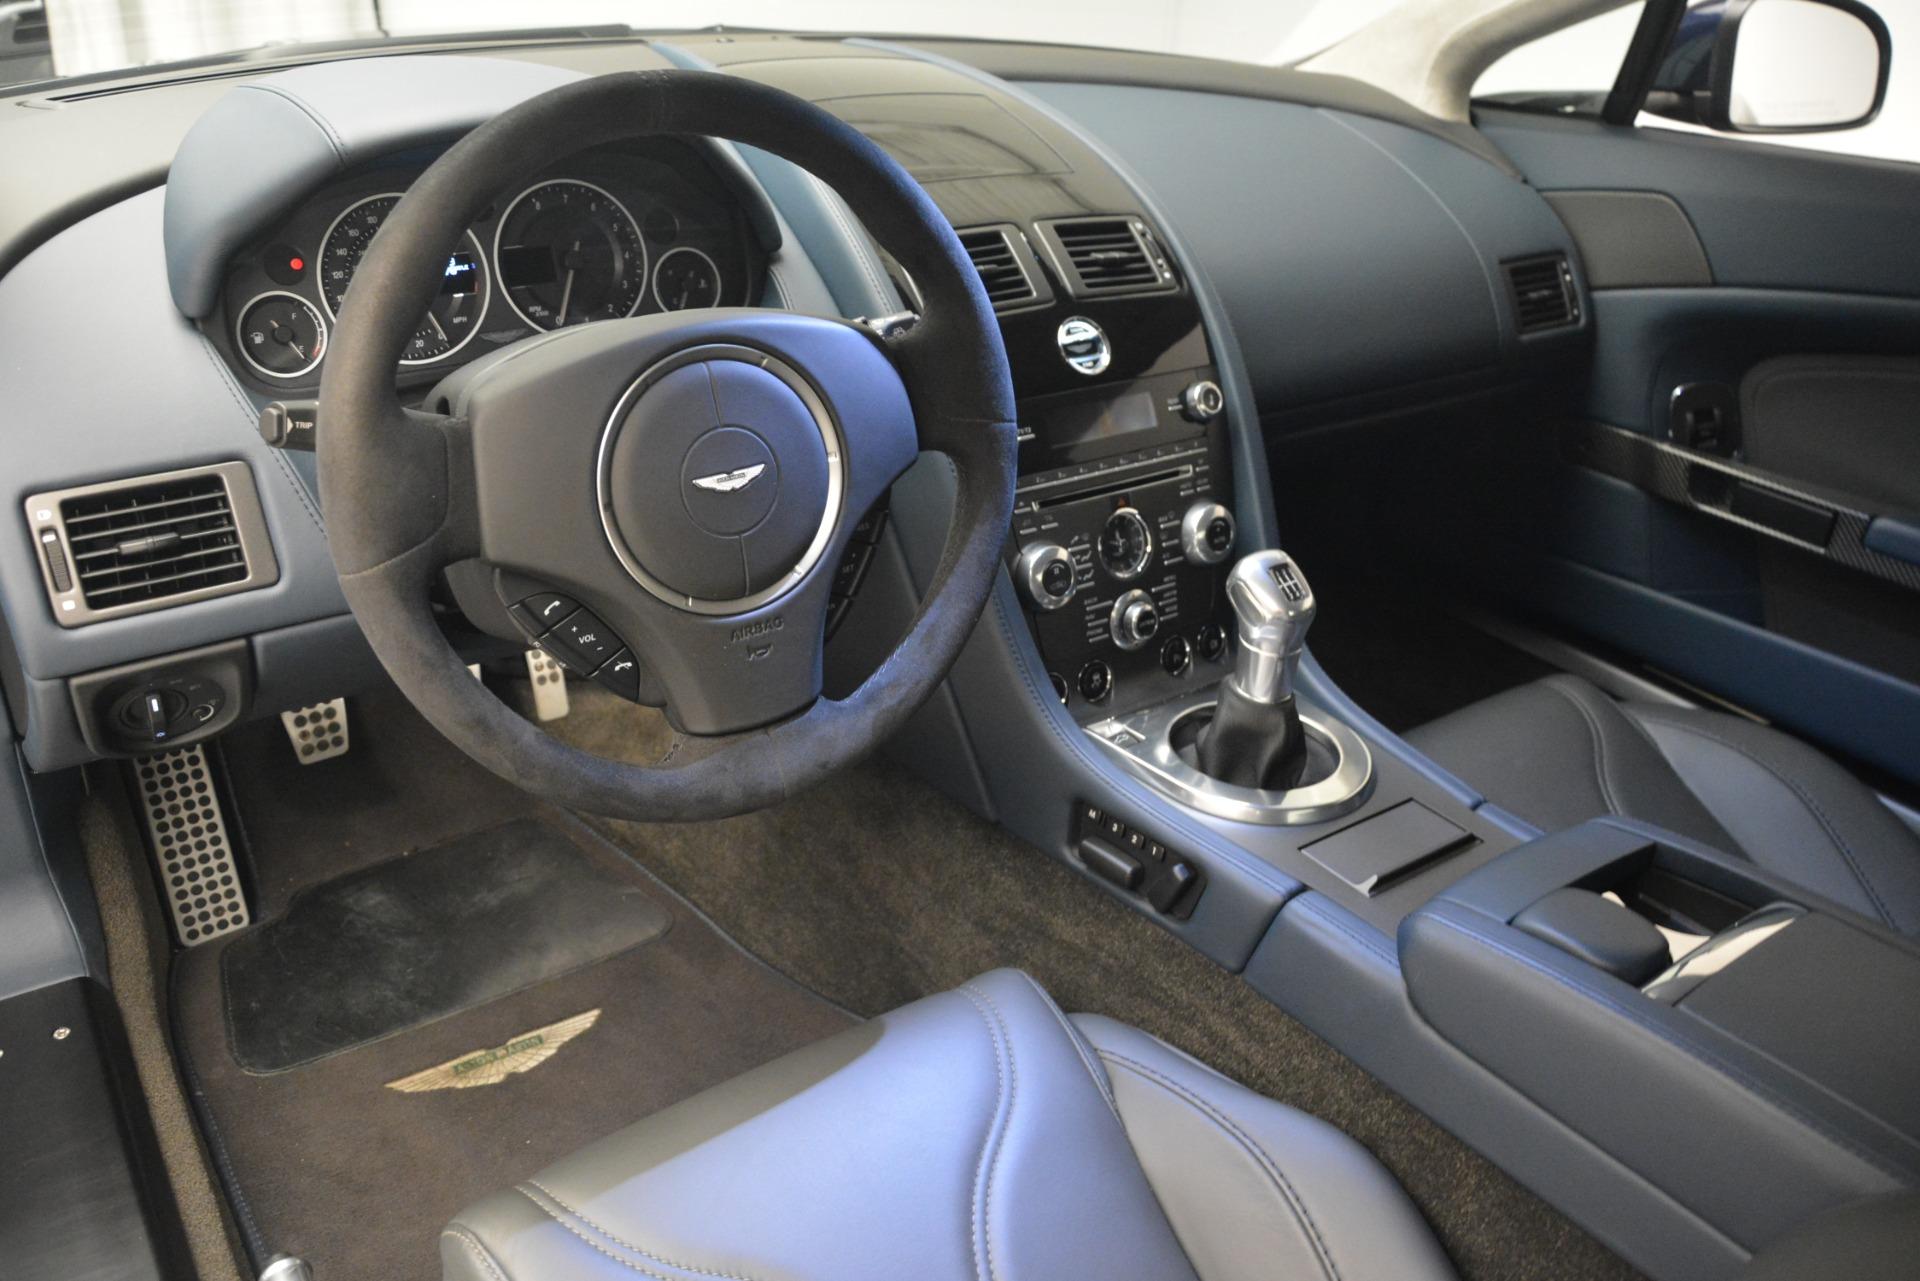 Used 2012 Aston Martin V12 Vantage  For Sale In Greenwich, CT. Alfa Romeo of Greenwich, 7524 3046_p14